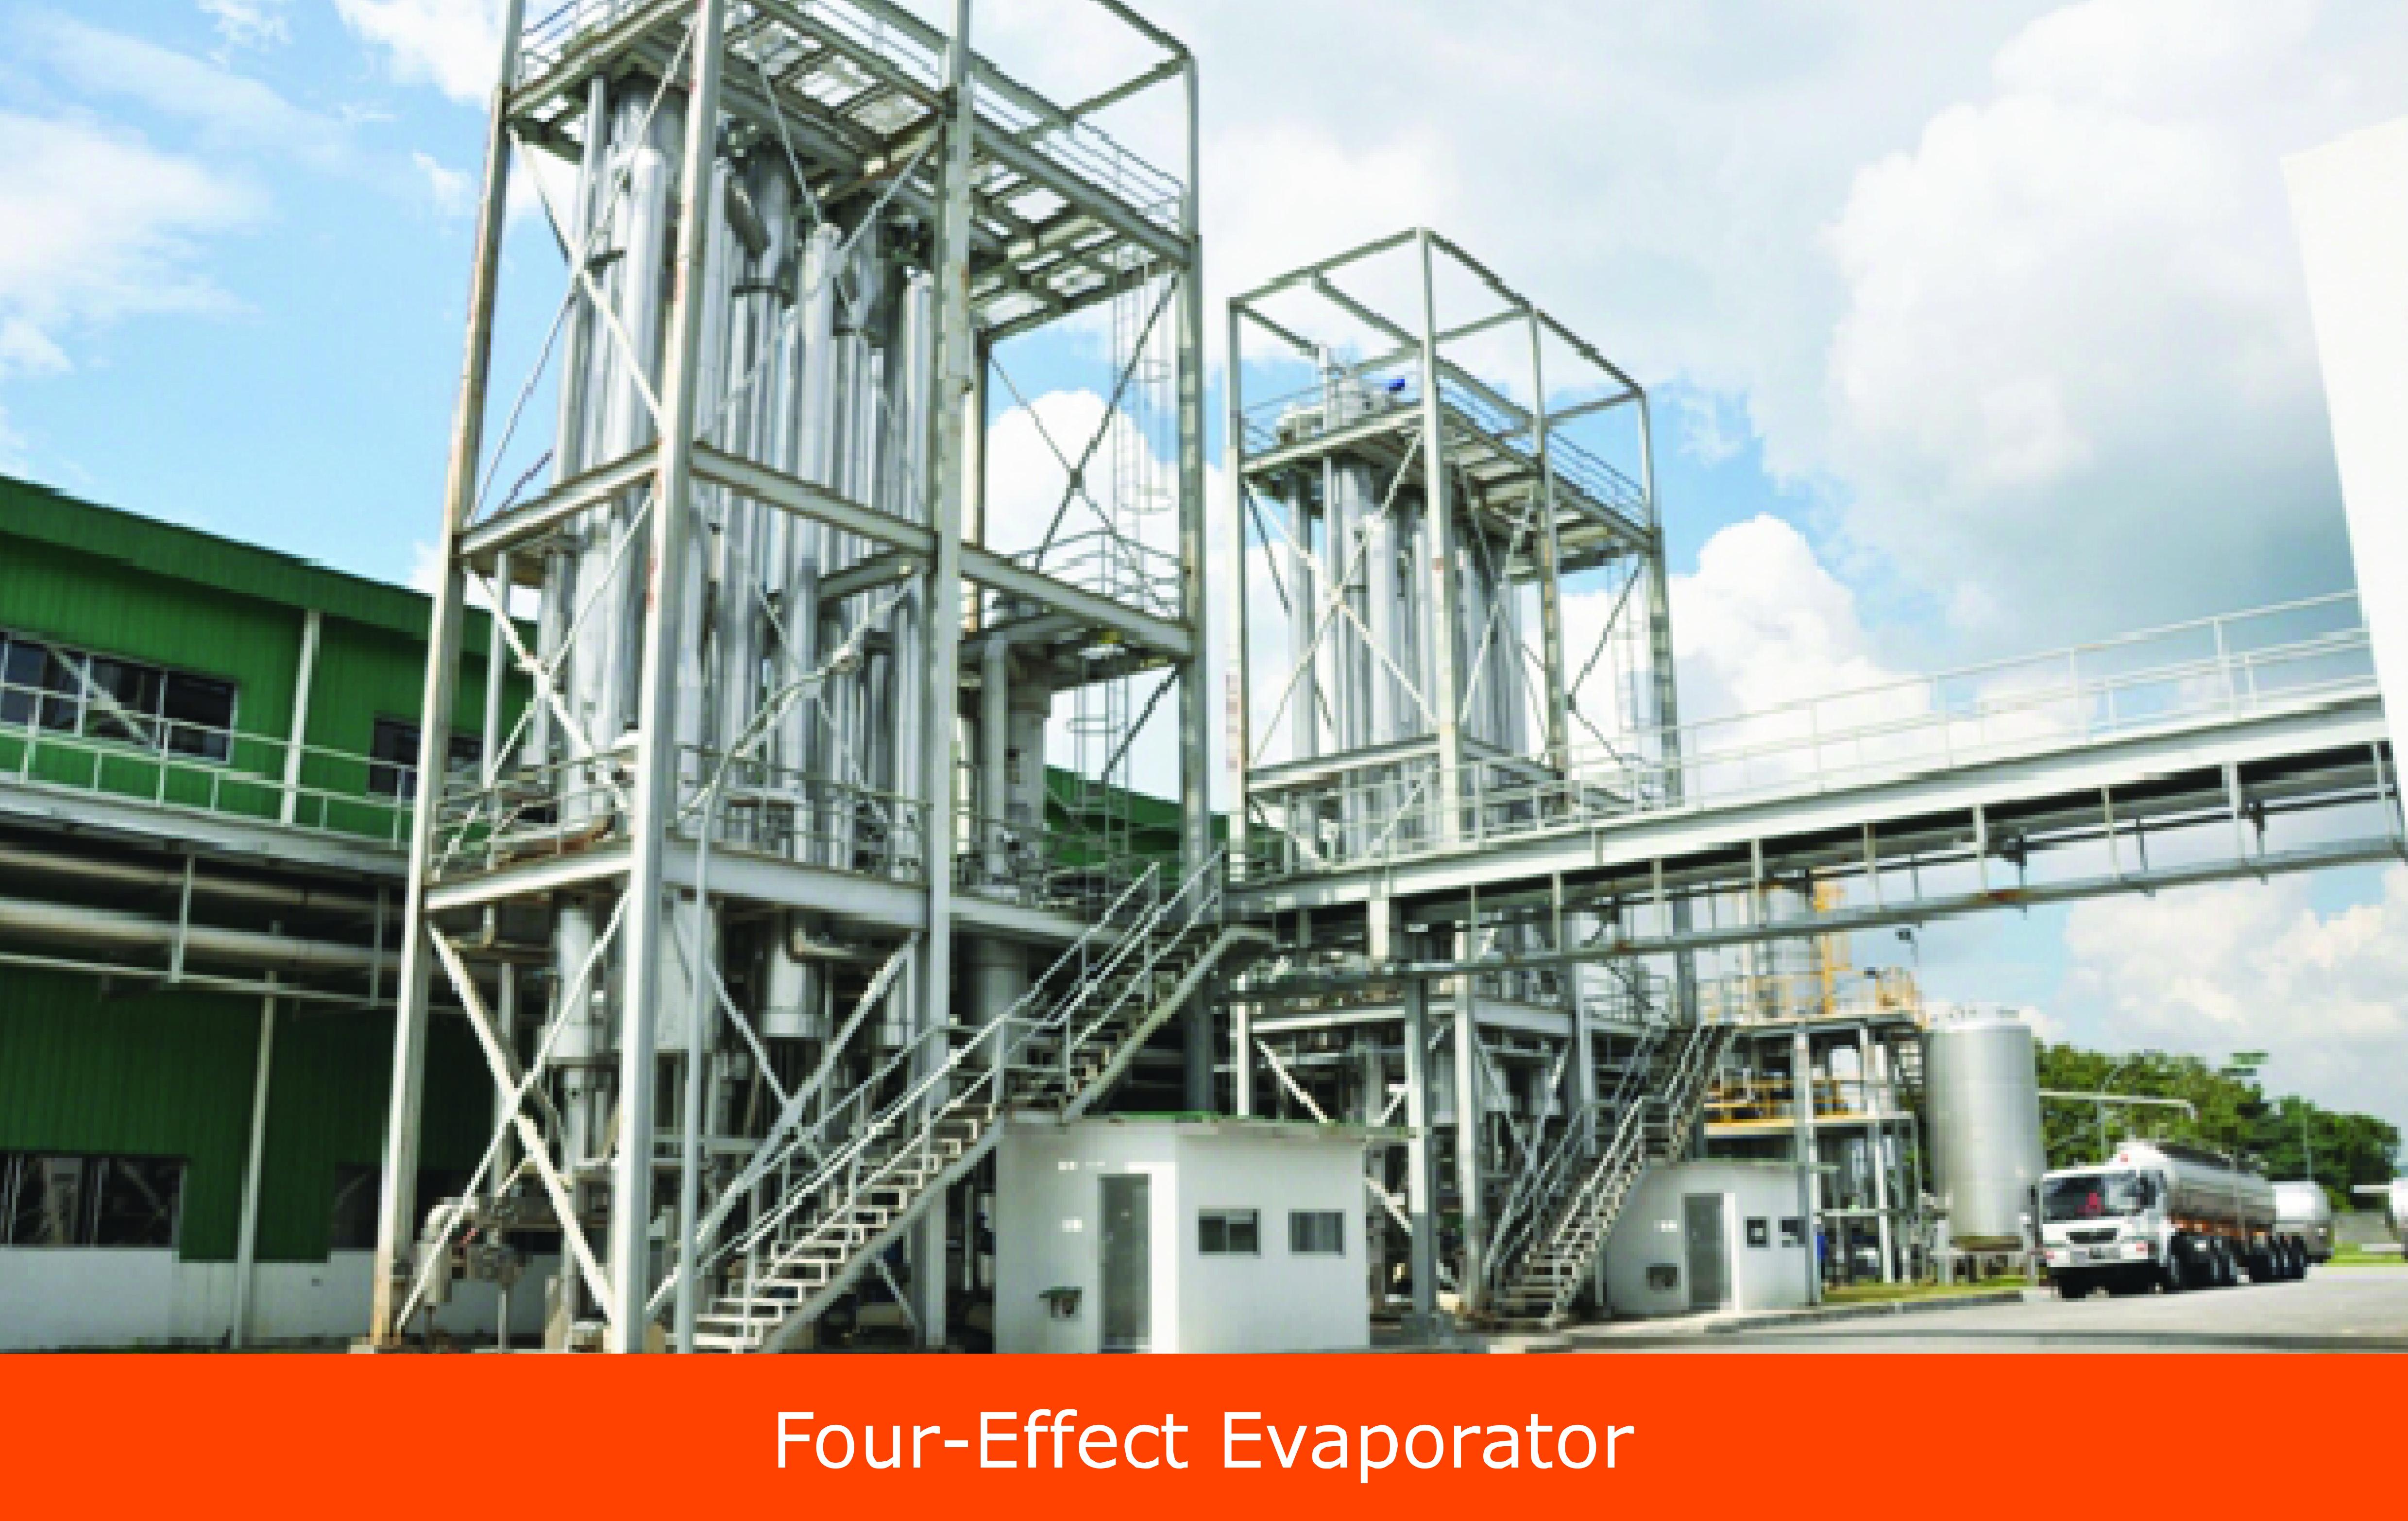 fructose7_four-effect-evaporator